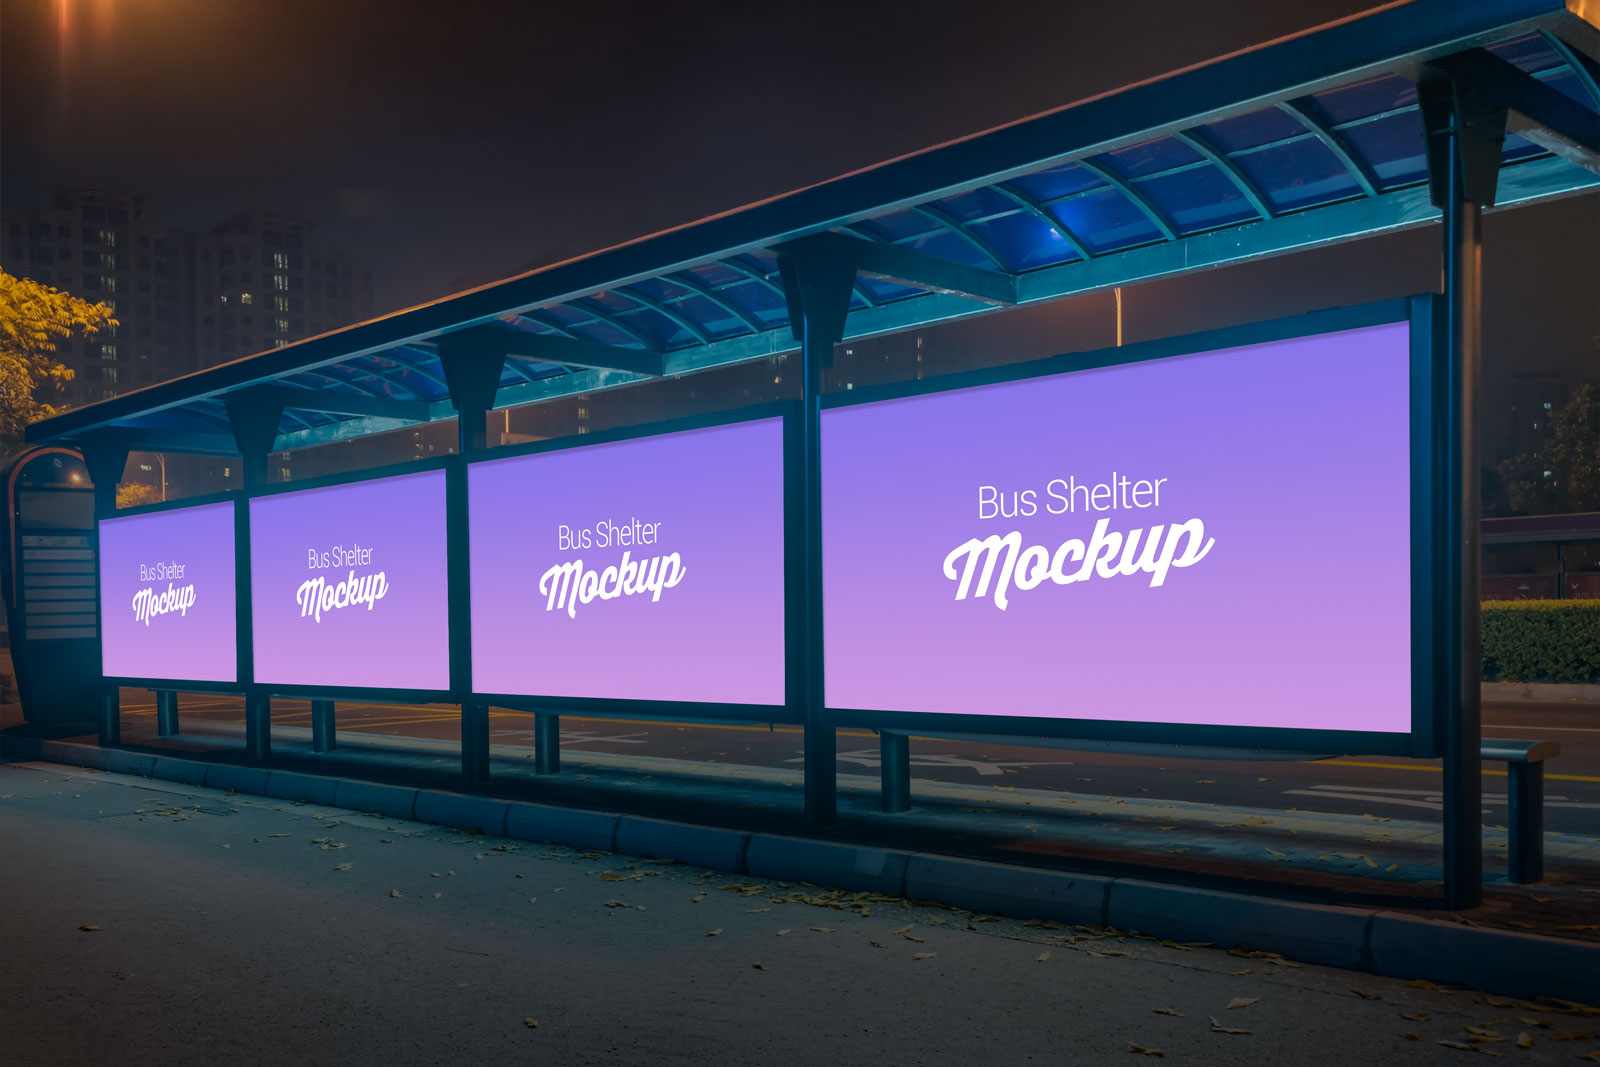 Free-Outdoor-Advertising-Bus-Shelter-Billboard-Mockup-PSD